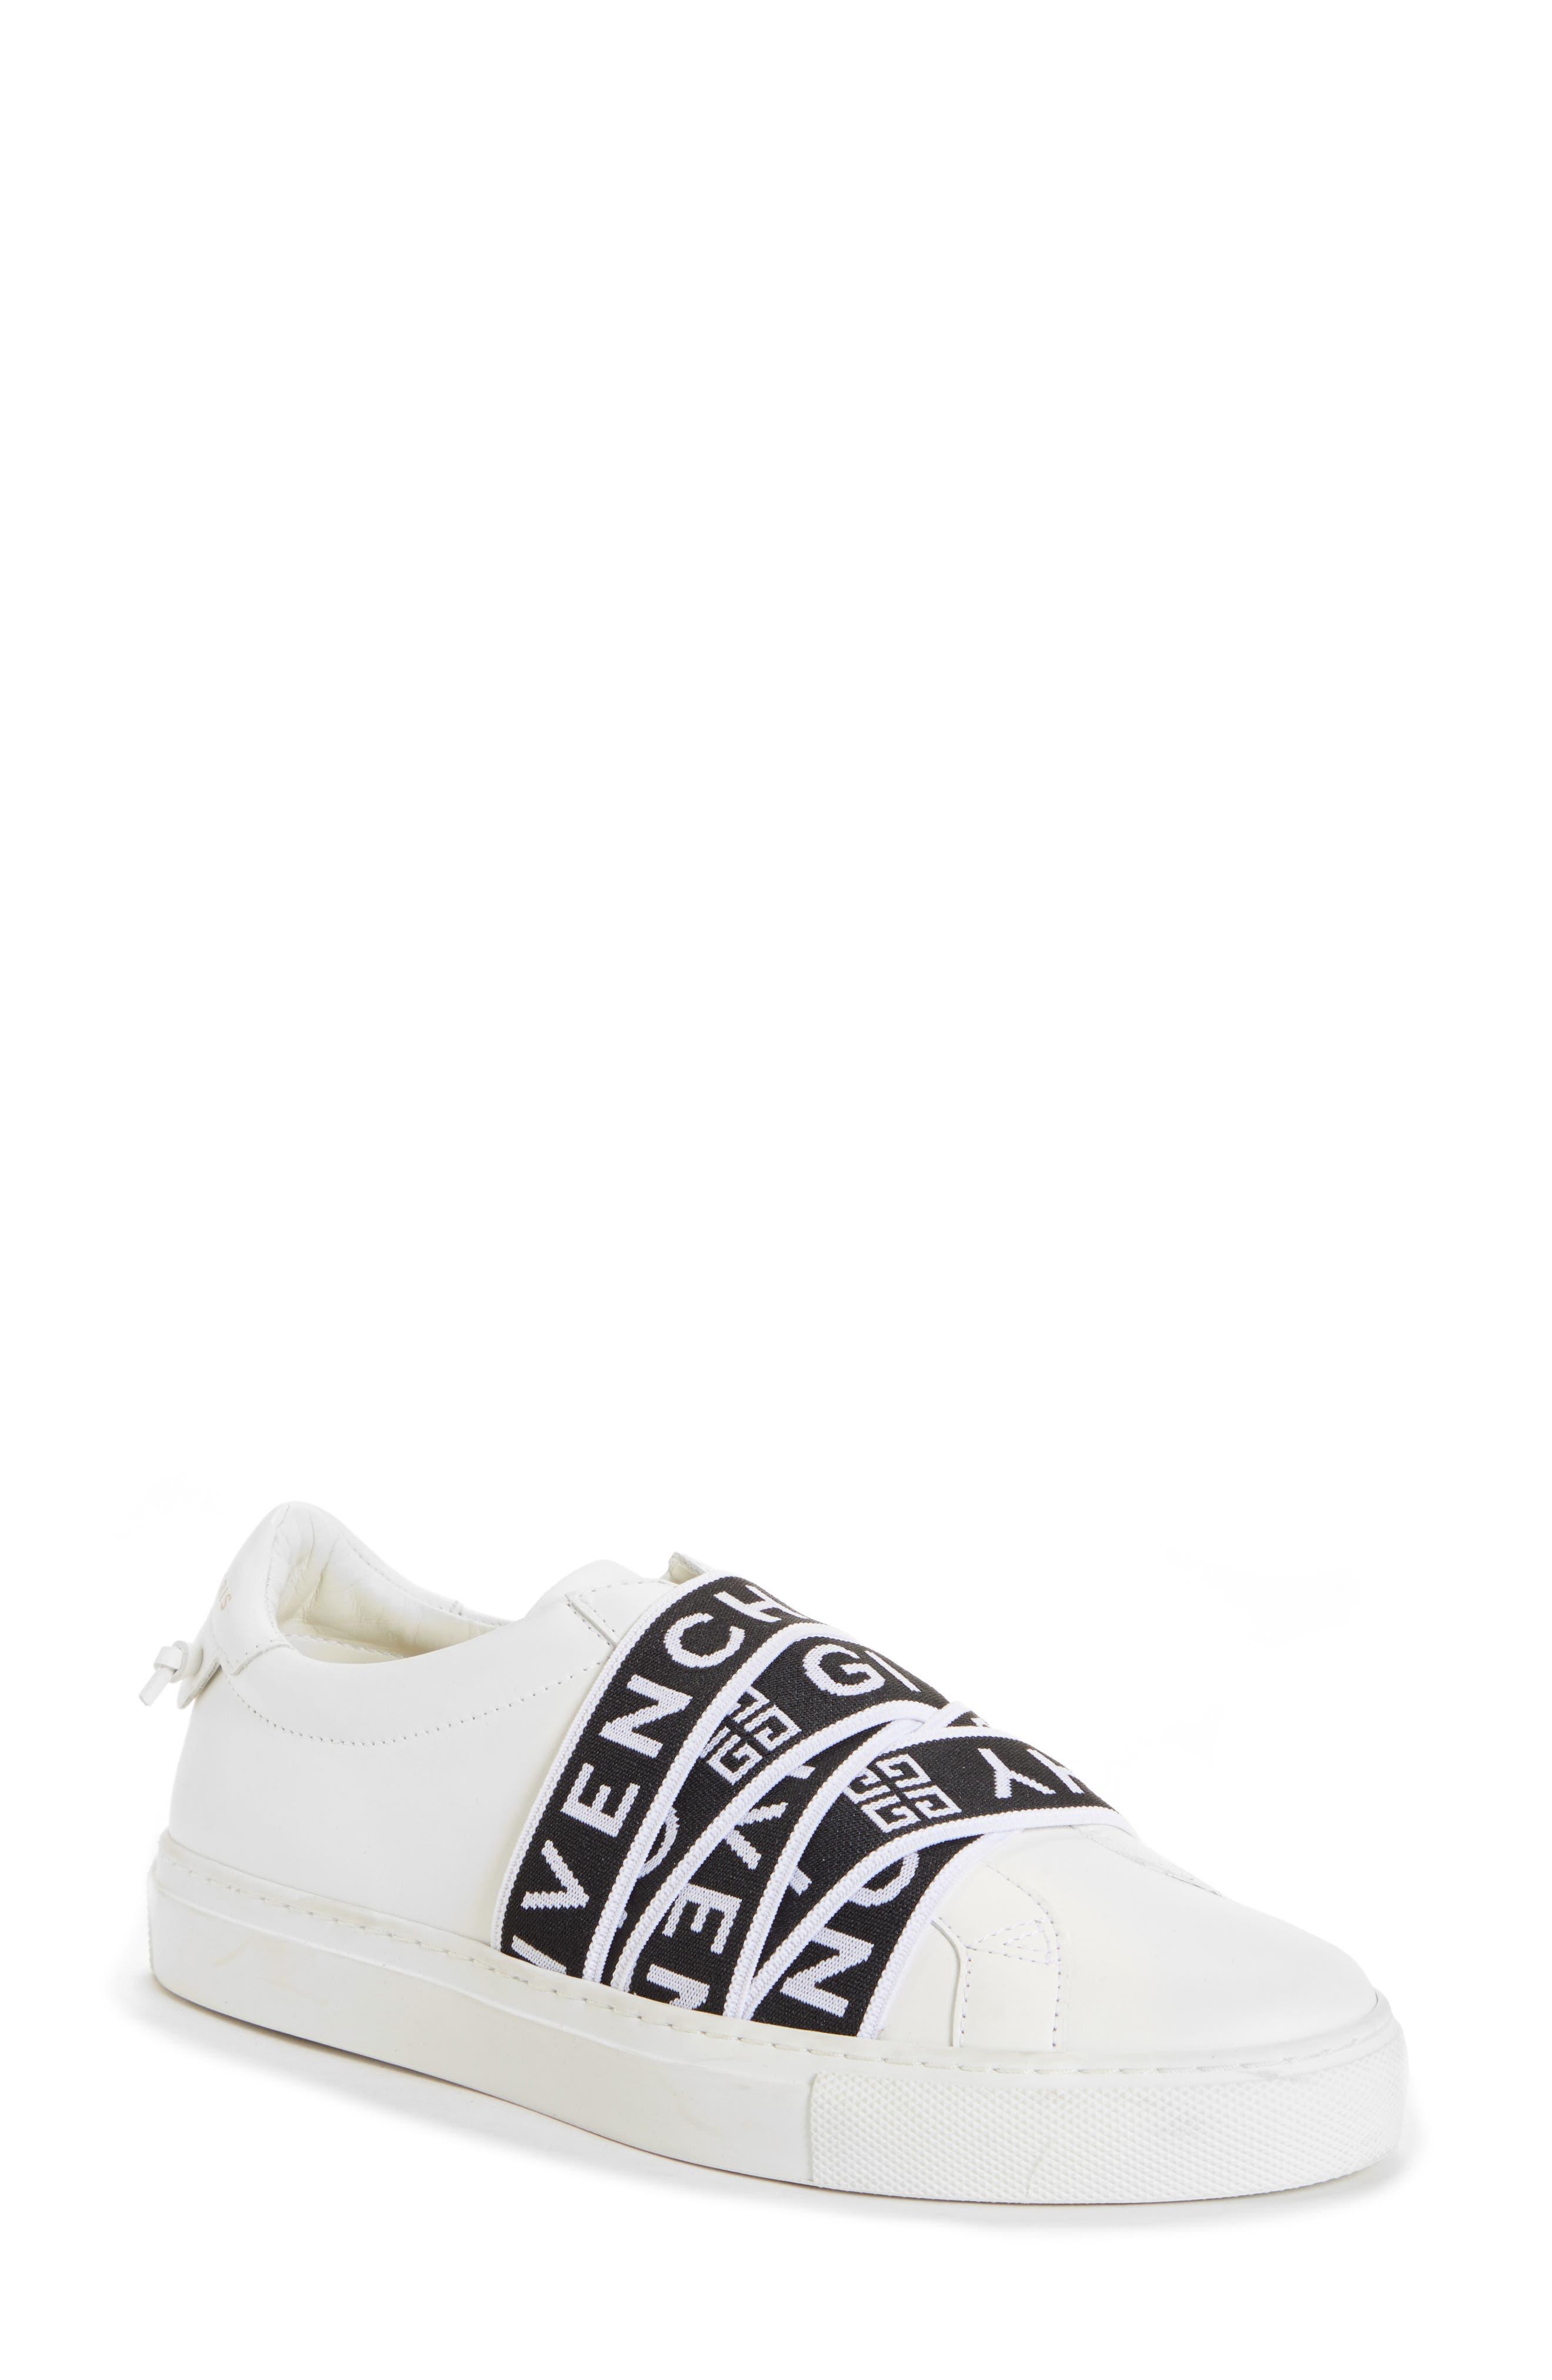 GIVENCHY,                             Urban Street Logo Strap Sneaker,                             Main thumbnail 1, color,                             WHITE/ BLACK